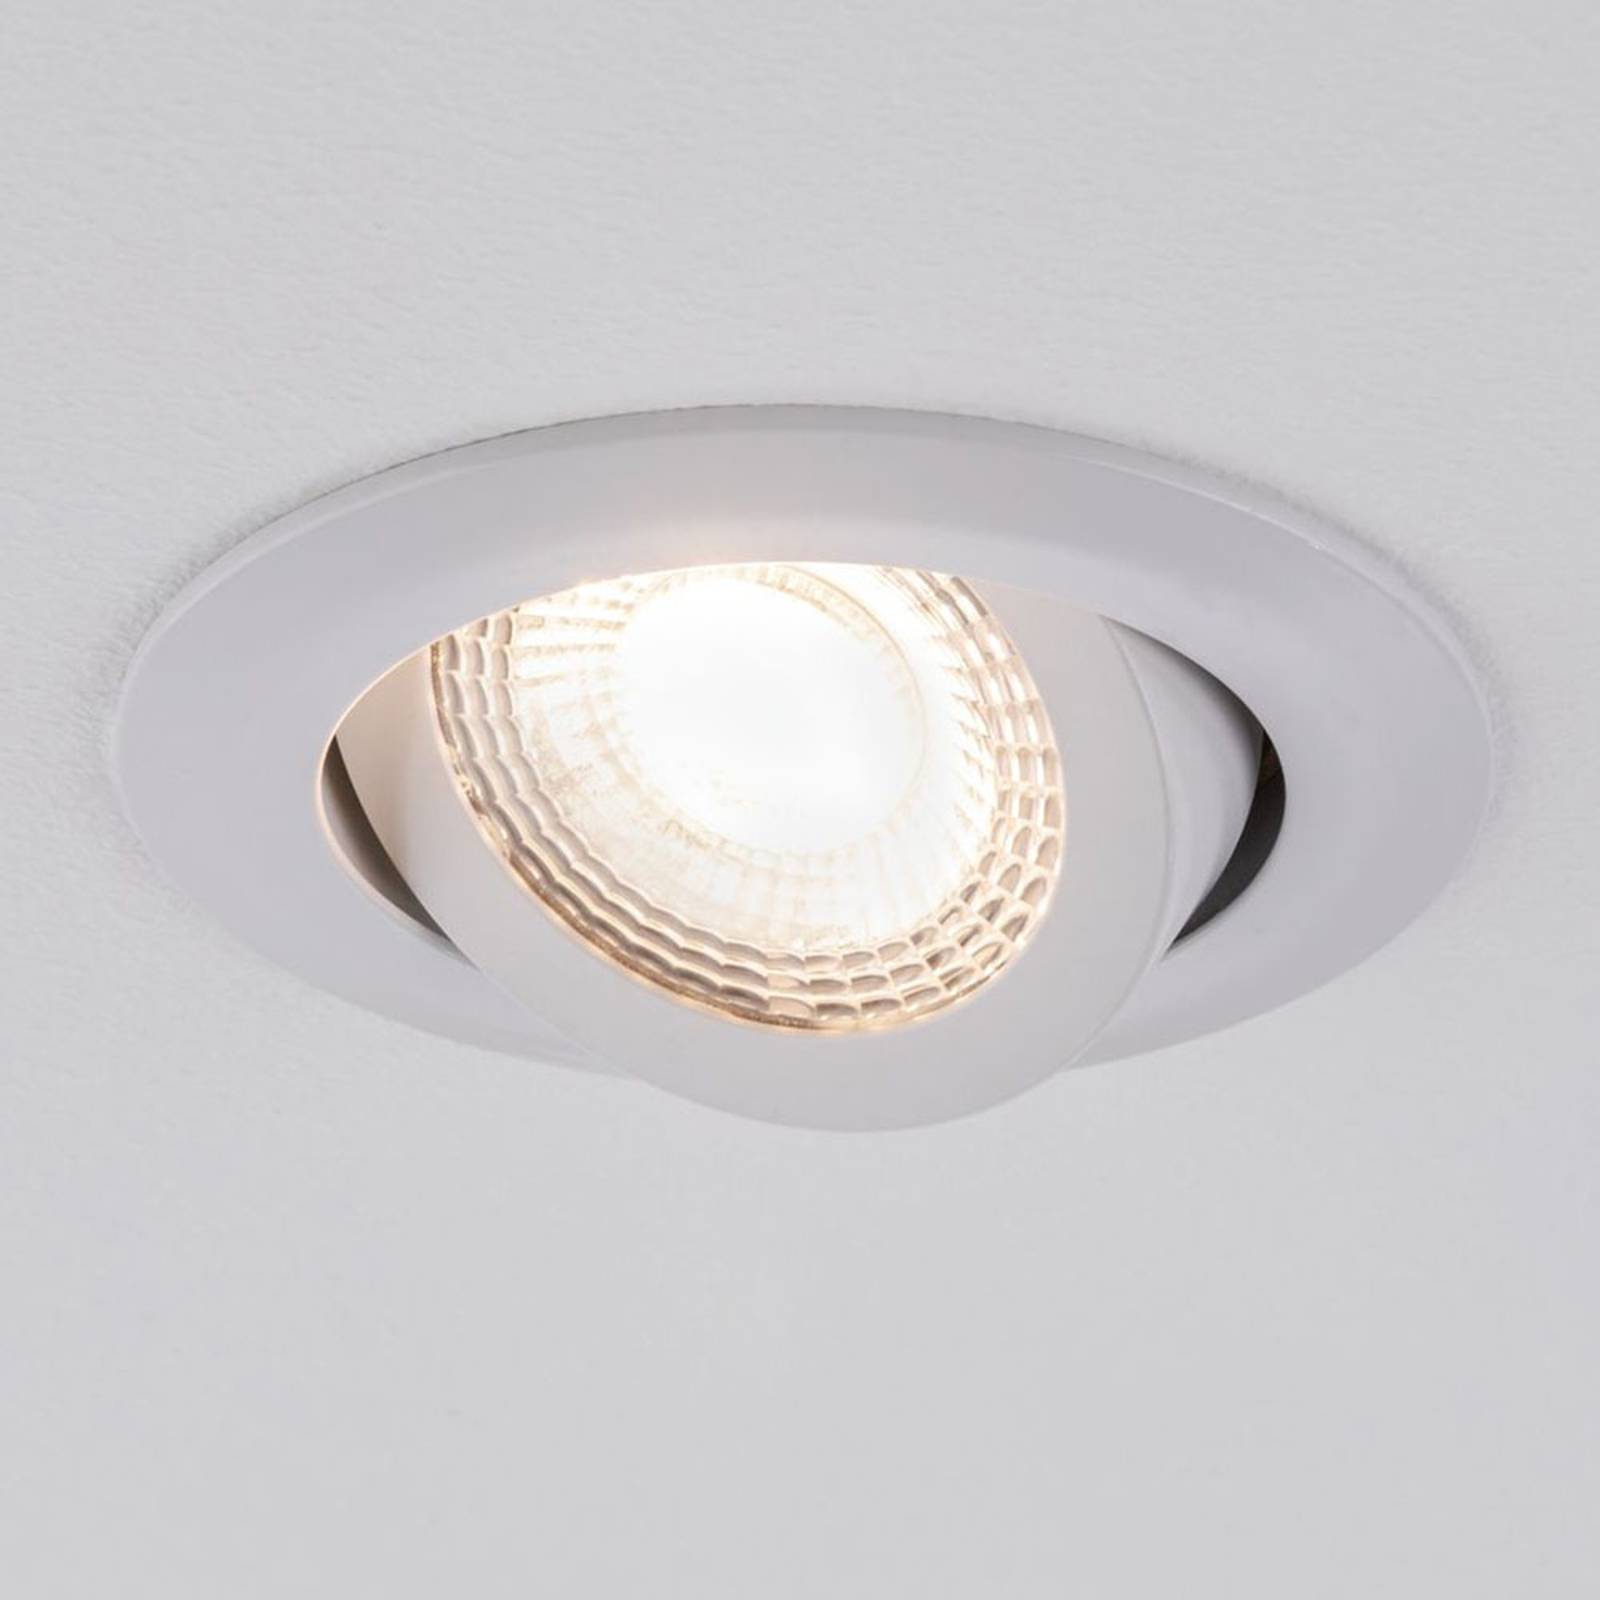 Paulmann 92985 LED inbouwspot 3 x 6W, wit mat